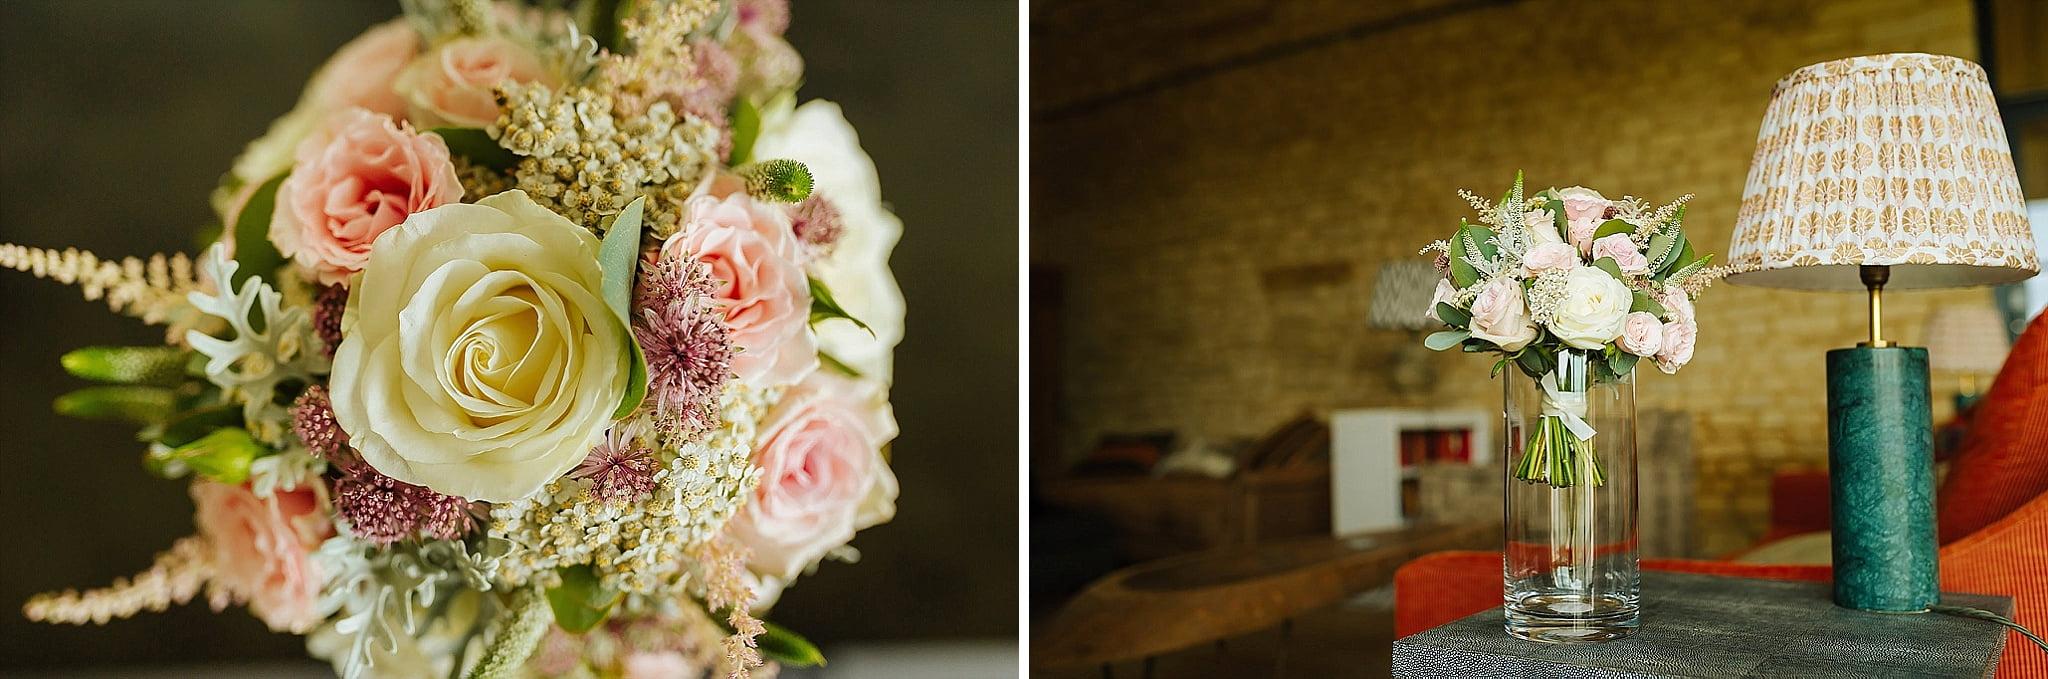 stone-barn-wedding-cotswolds (1)